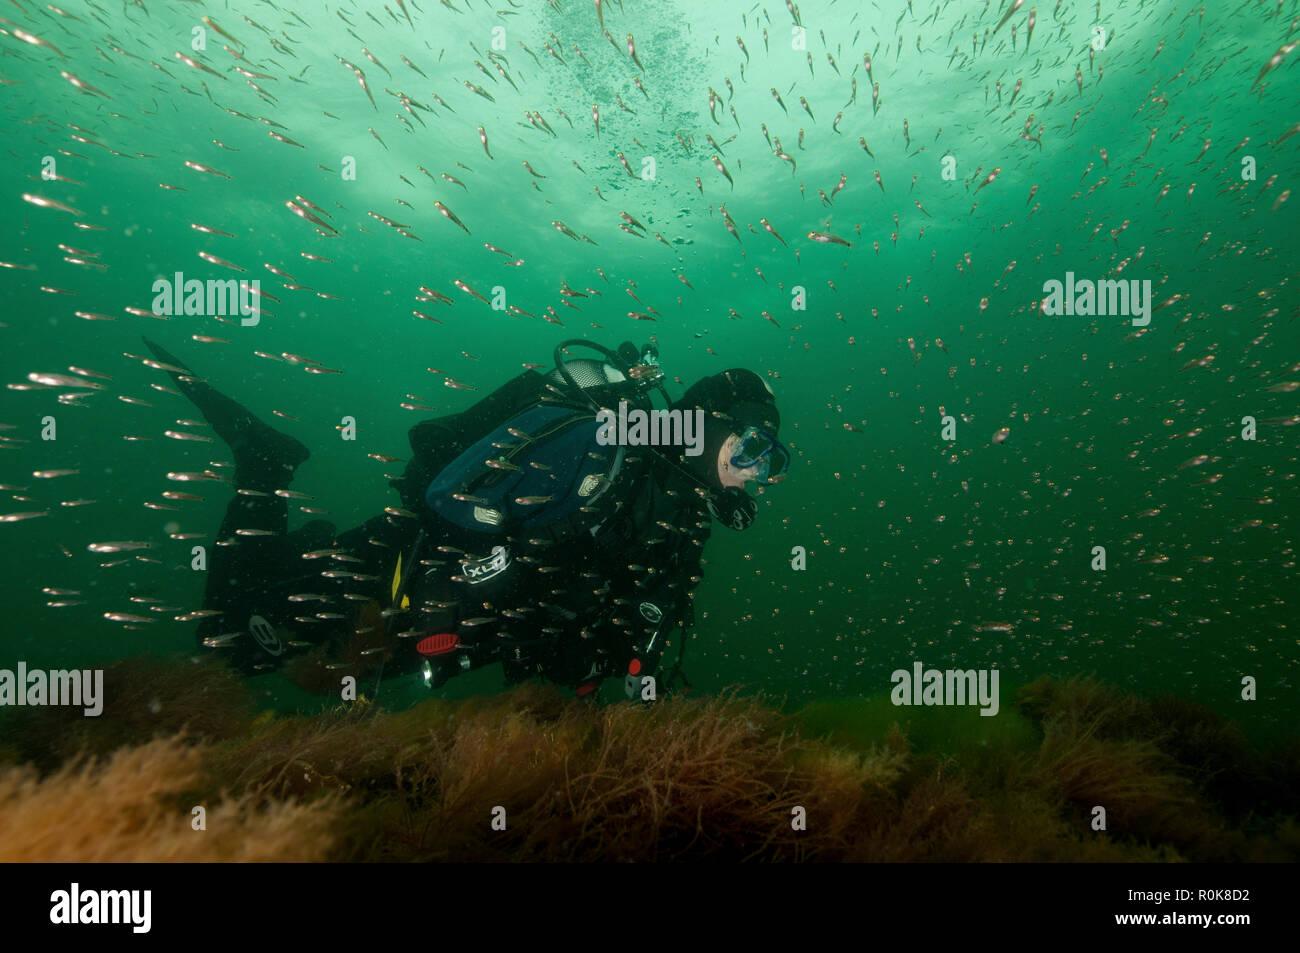 Juvenile fish and diver on wreck, Sjaelland shipwreck, Oresund, Denmark. - Stock Image